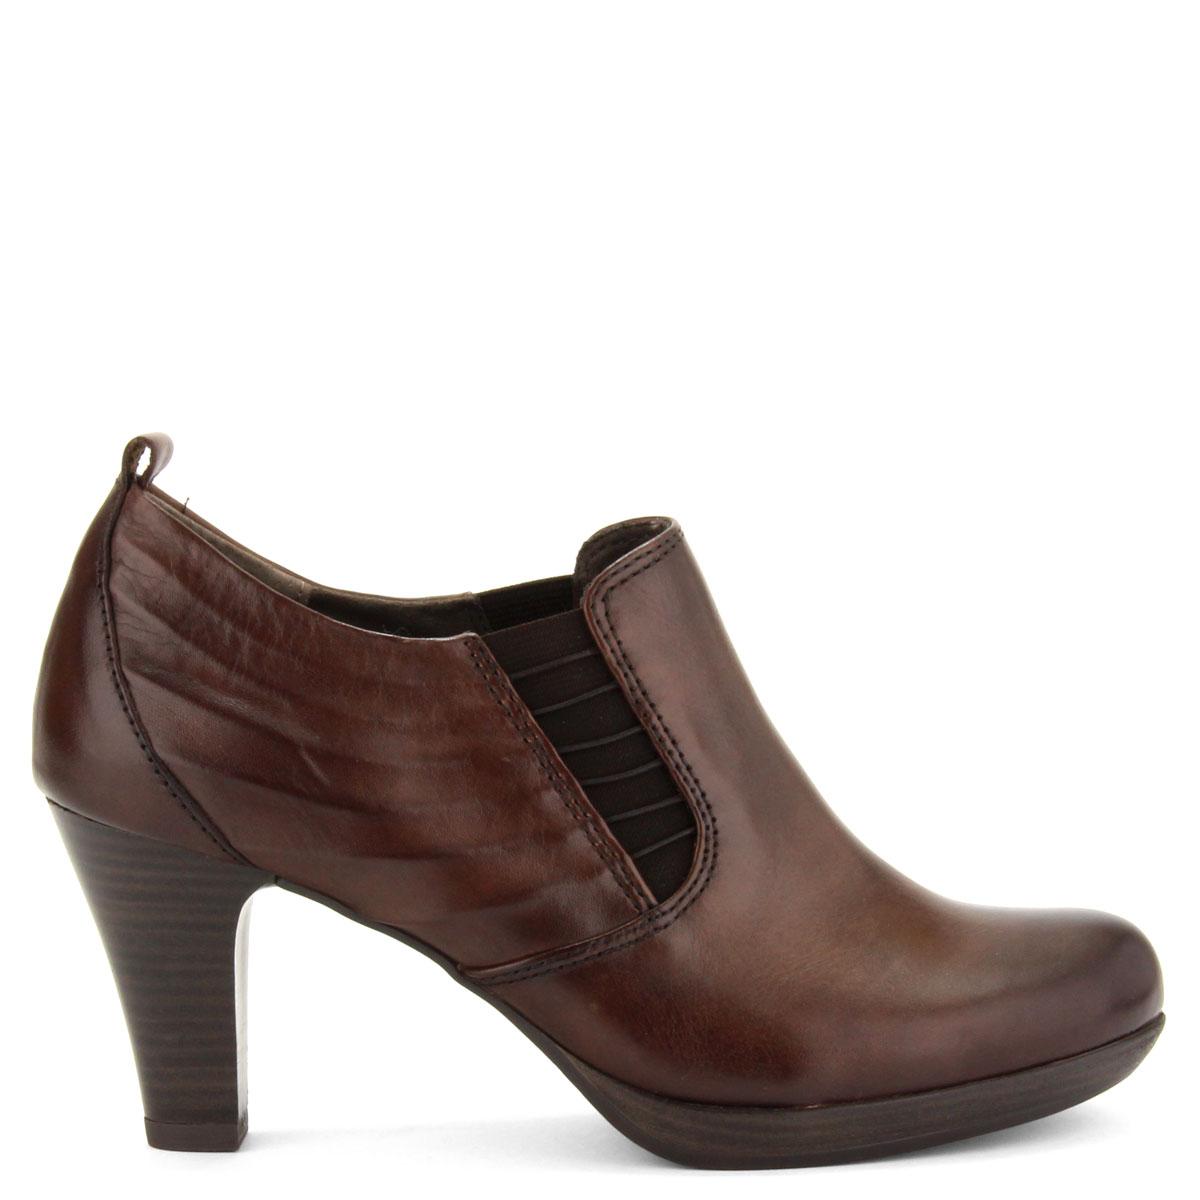 Platformos Tamaris női cipő barna színben. Sarka 7 cm magas 96d8a6ce92